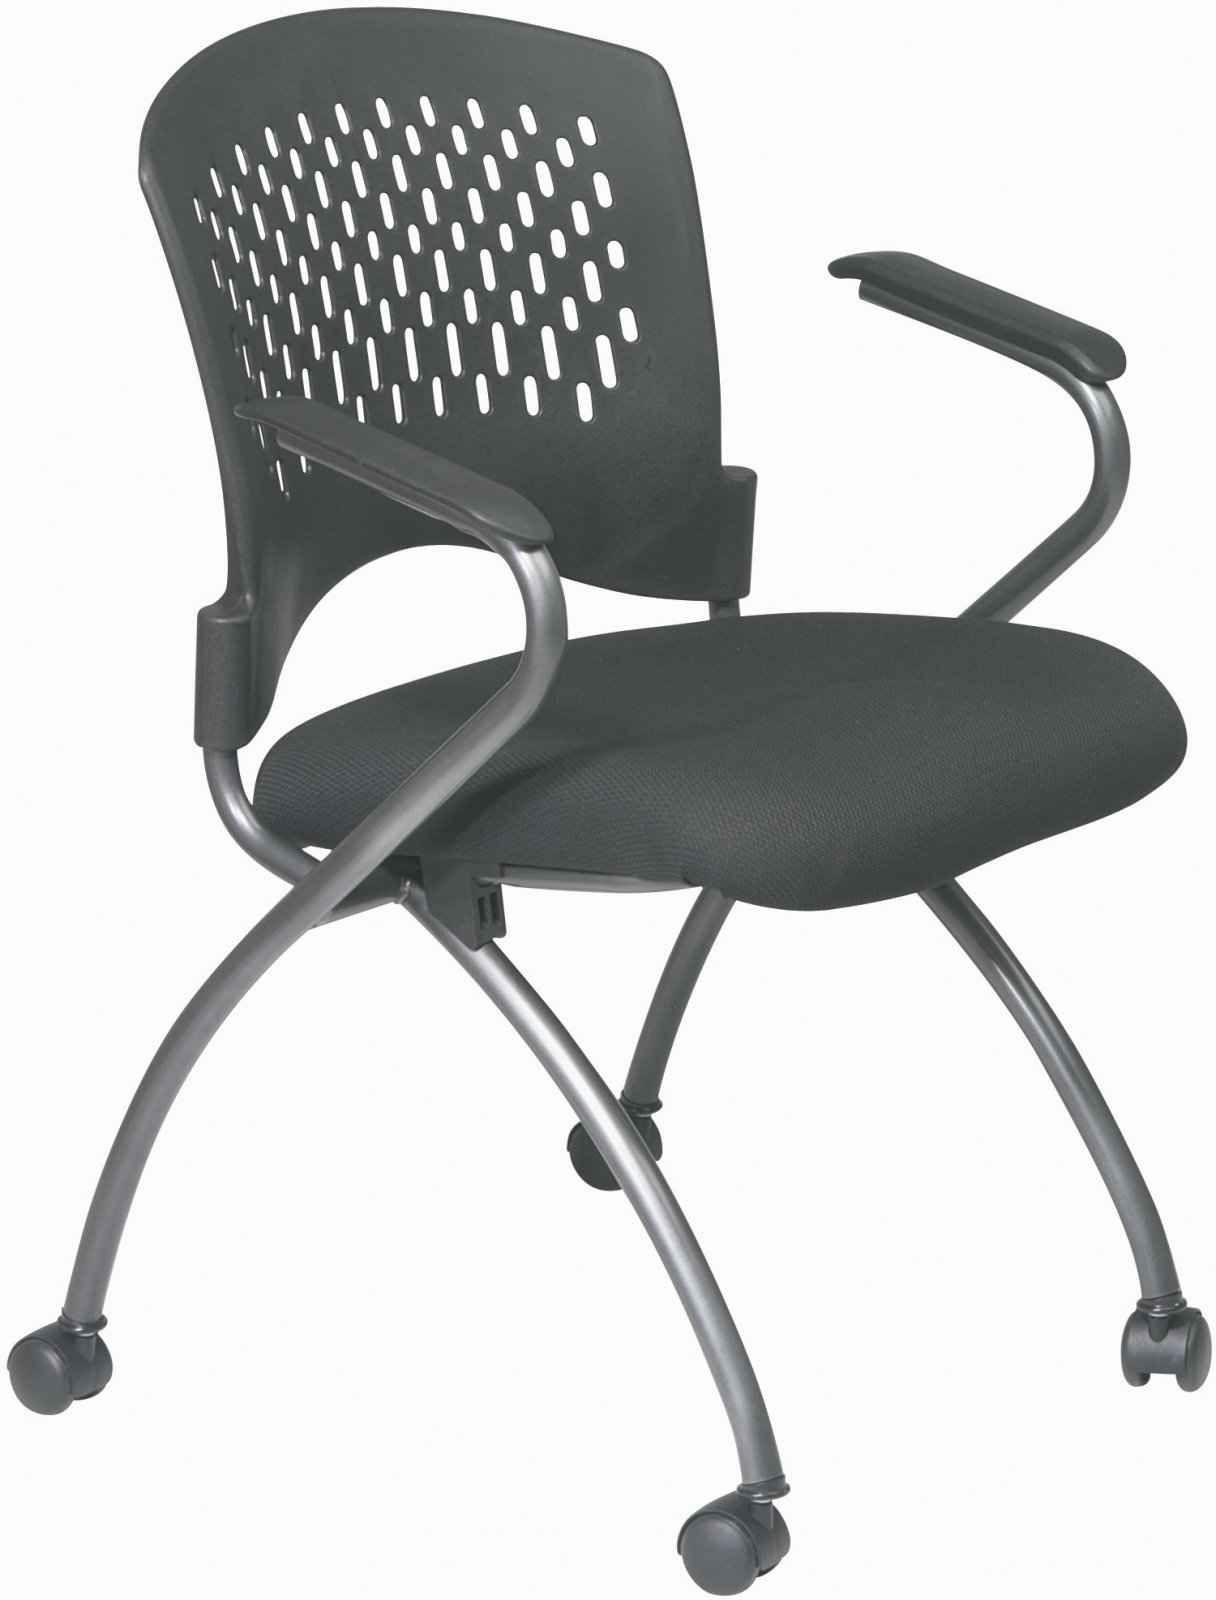 Folding Desk Chair Combination   http://devintavern.com   Pinterest ...